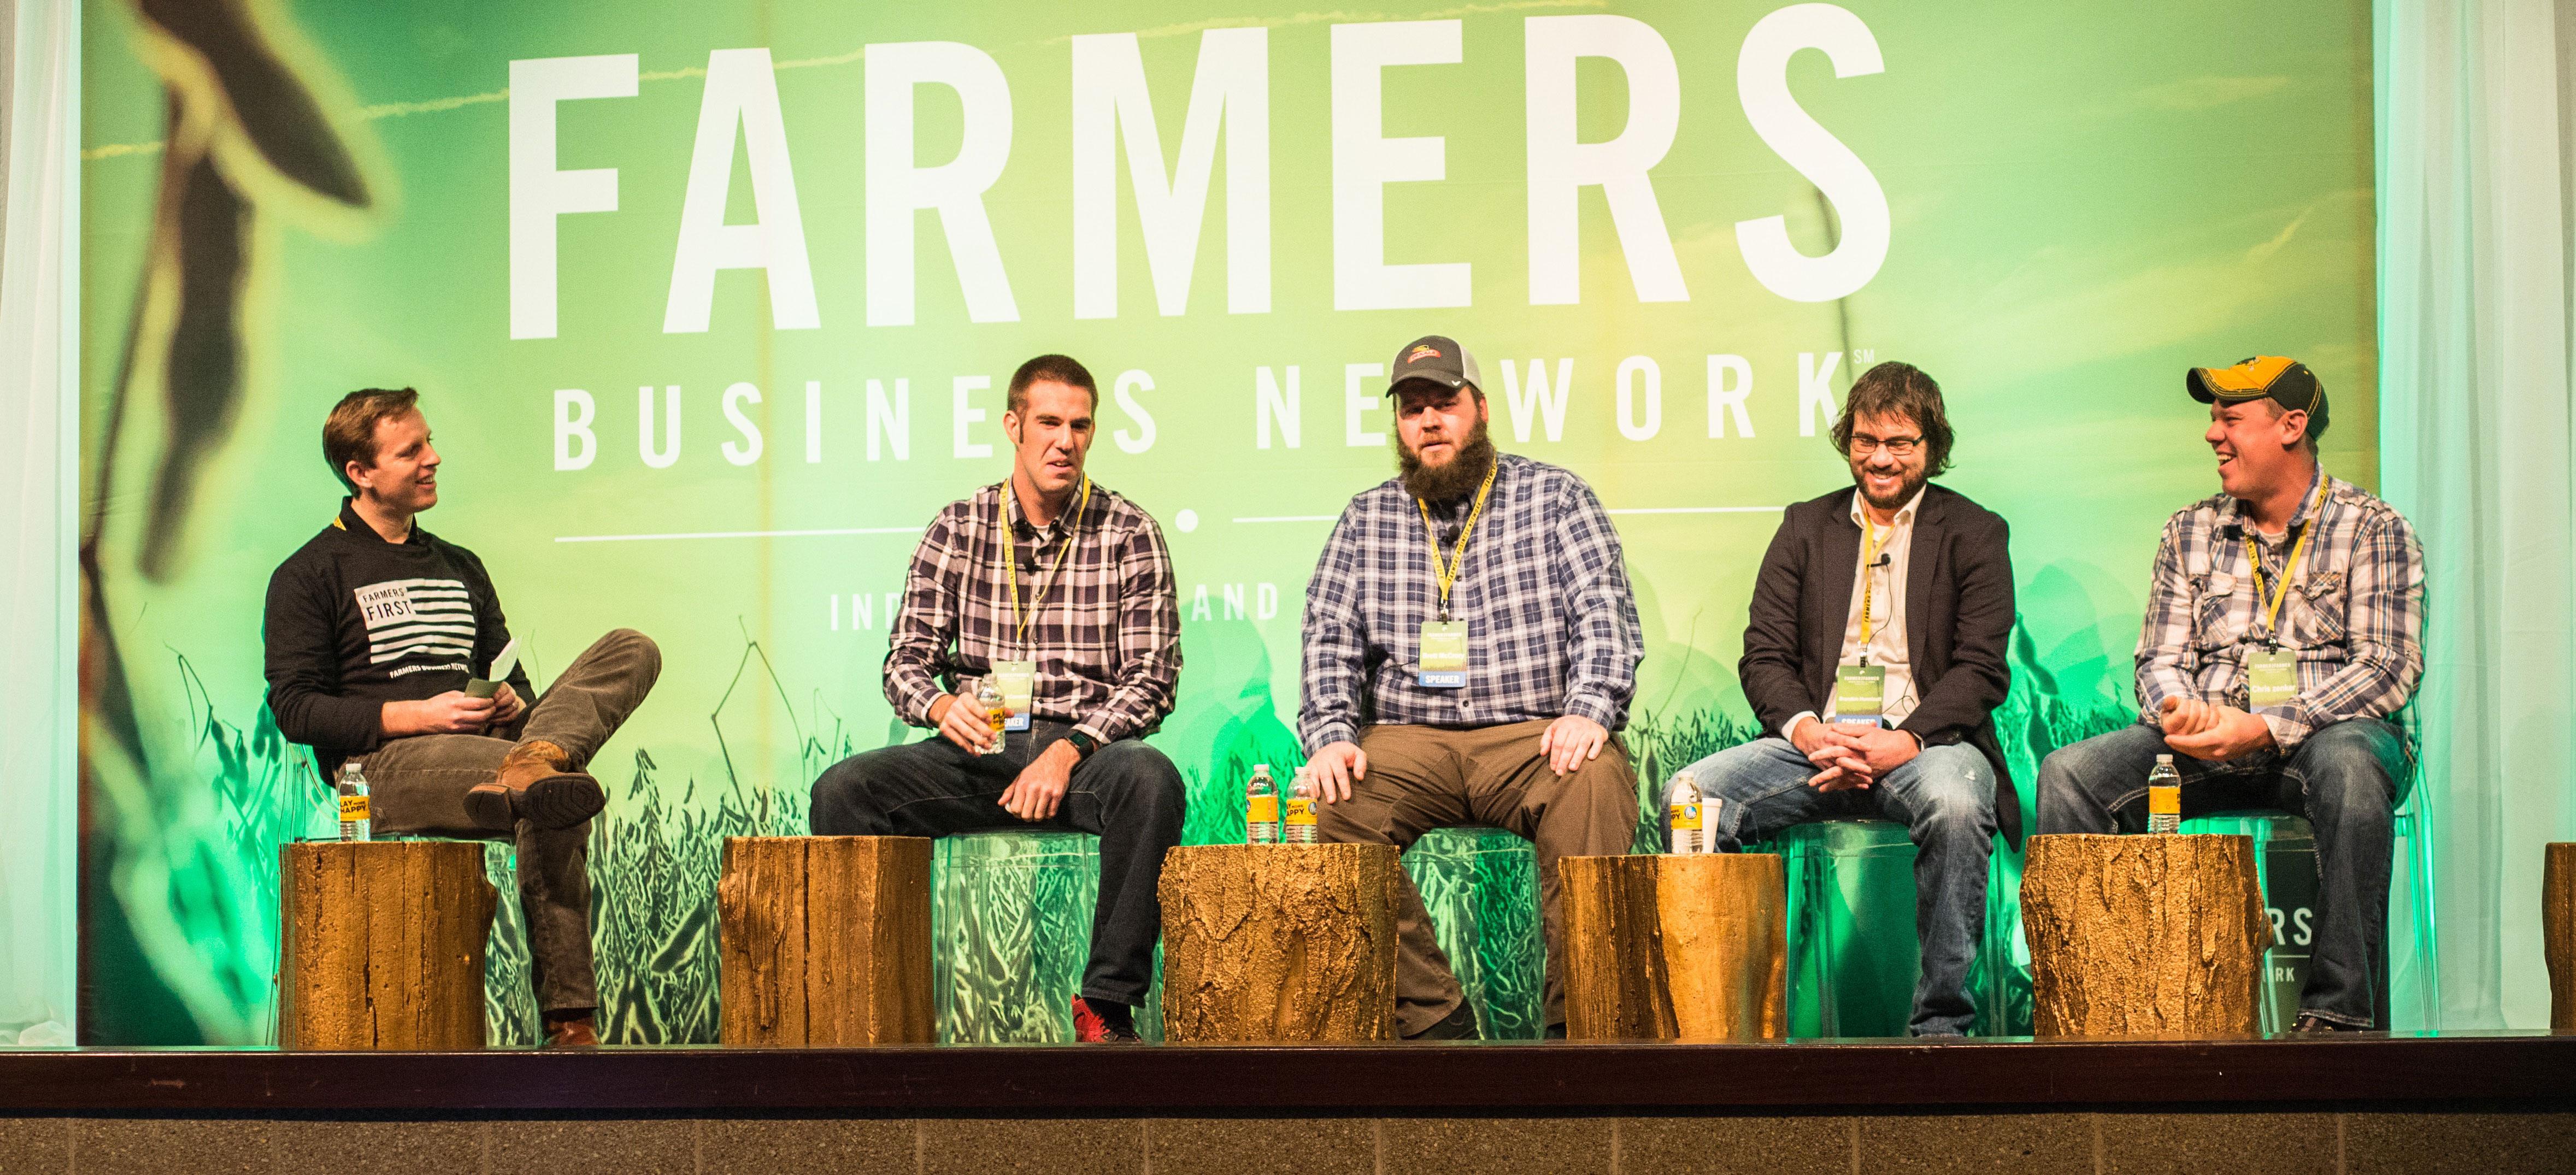 Farmers Network